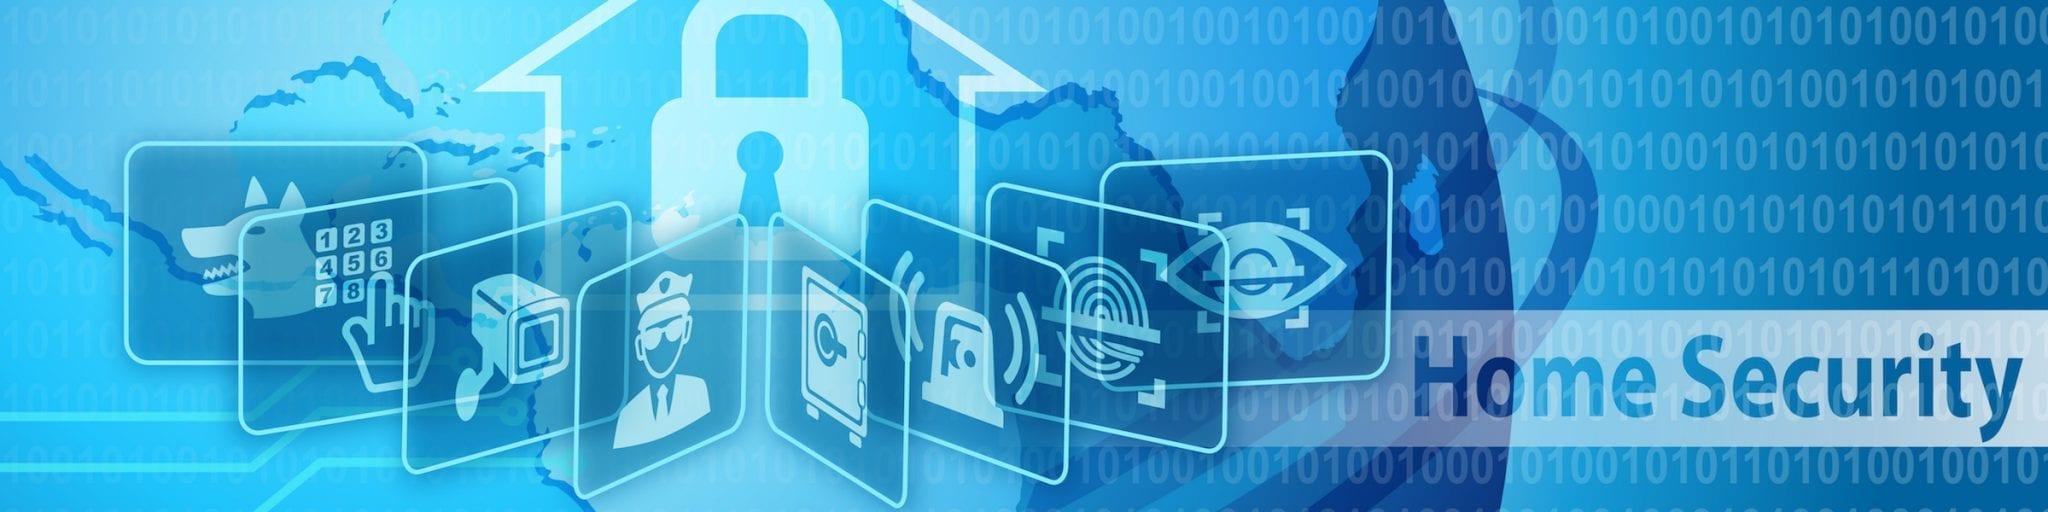 home security slide image